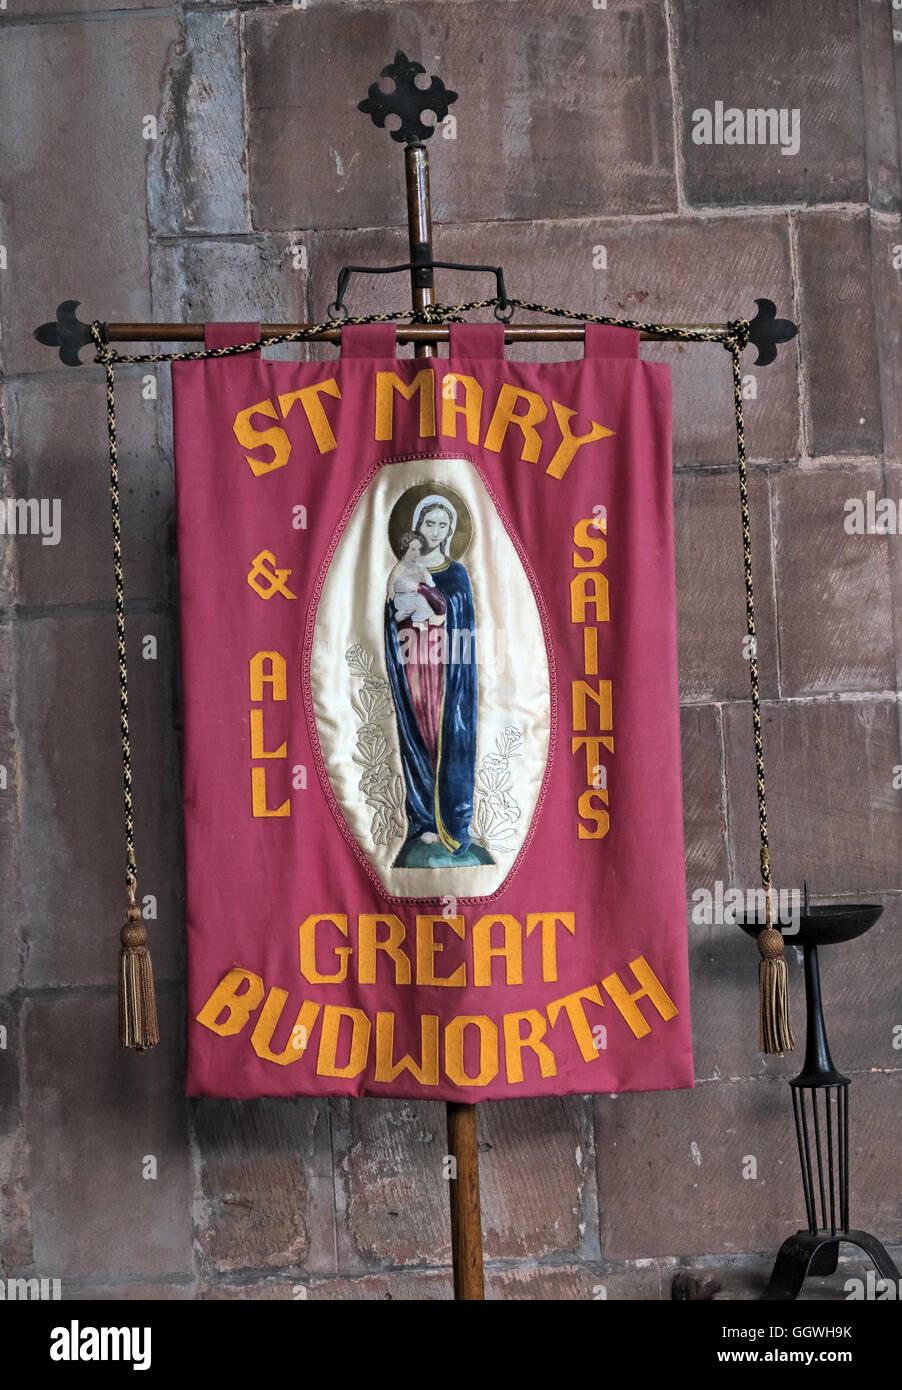 St Marys & All Saints Church Gt Budworth Interior, Cheshire, England,UK - walking banner Stock Photo